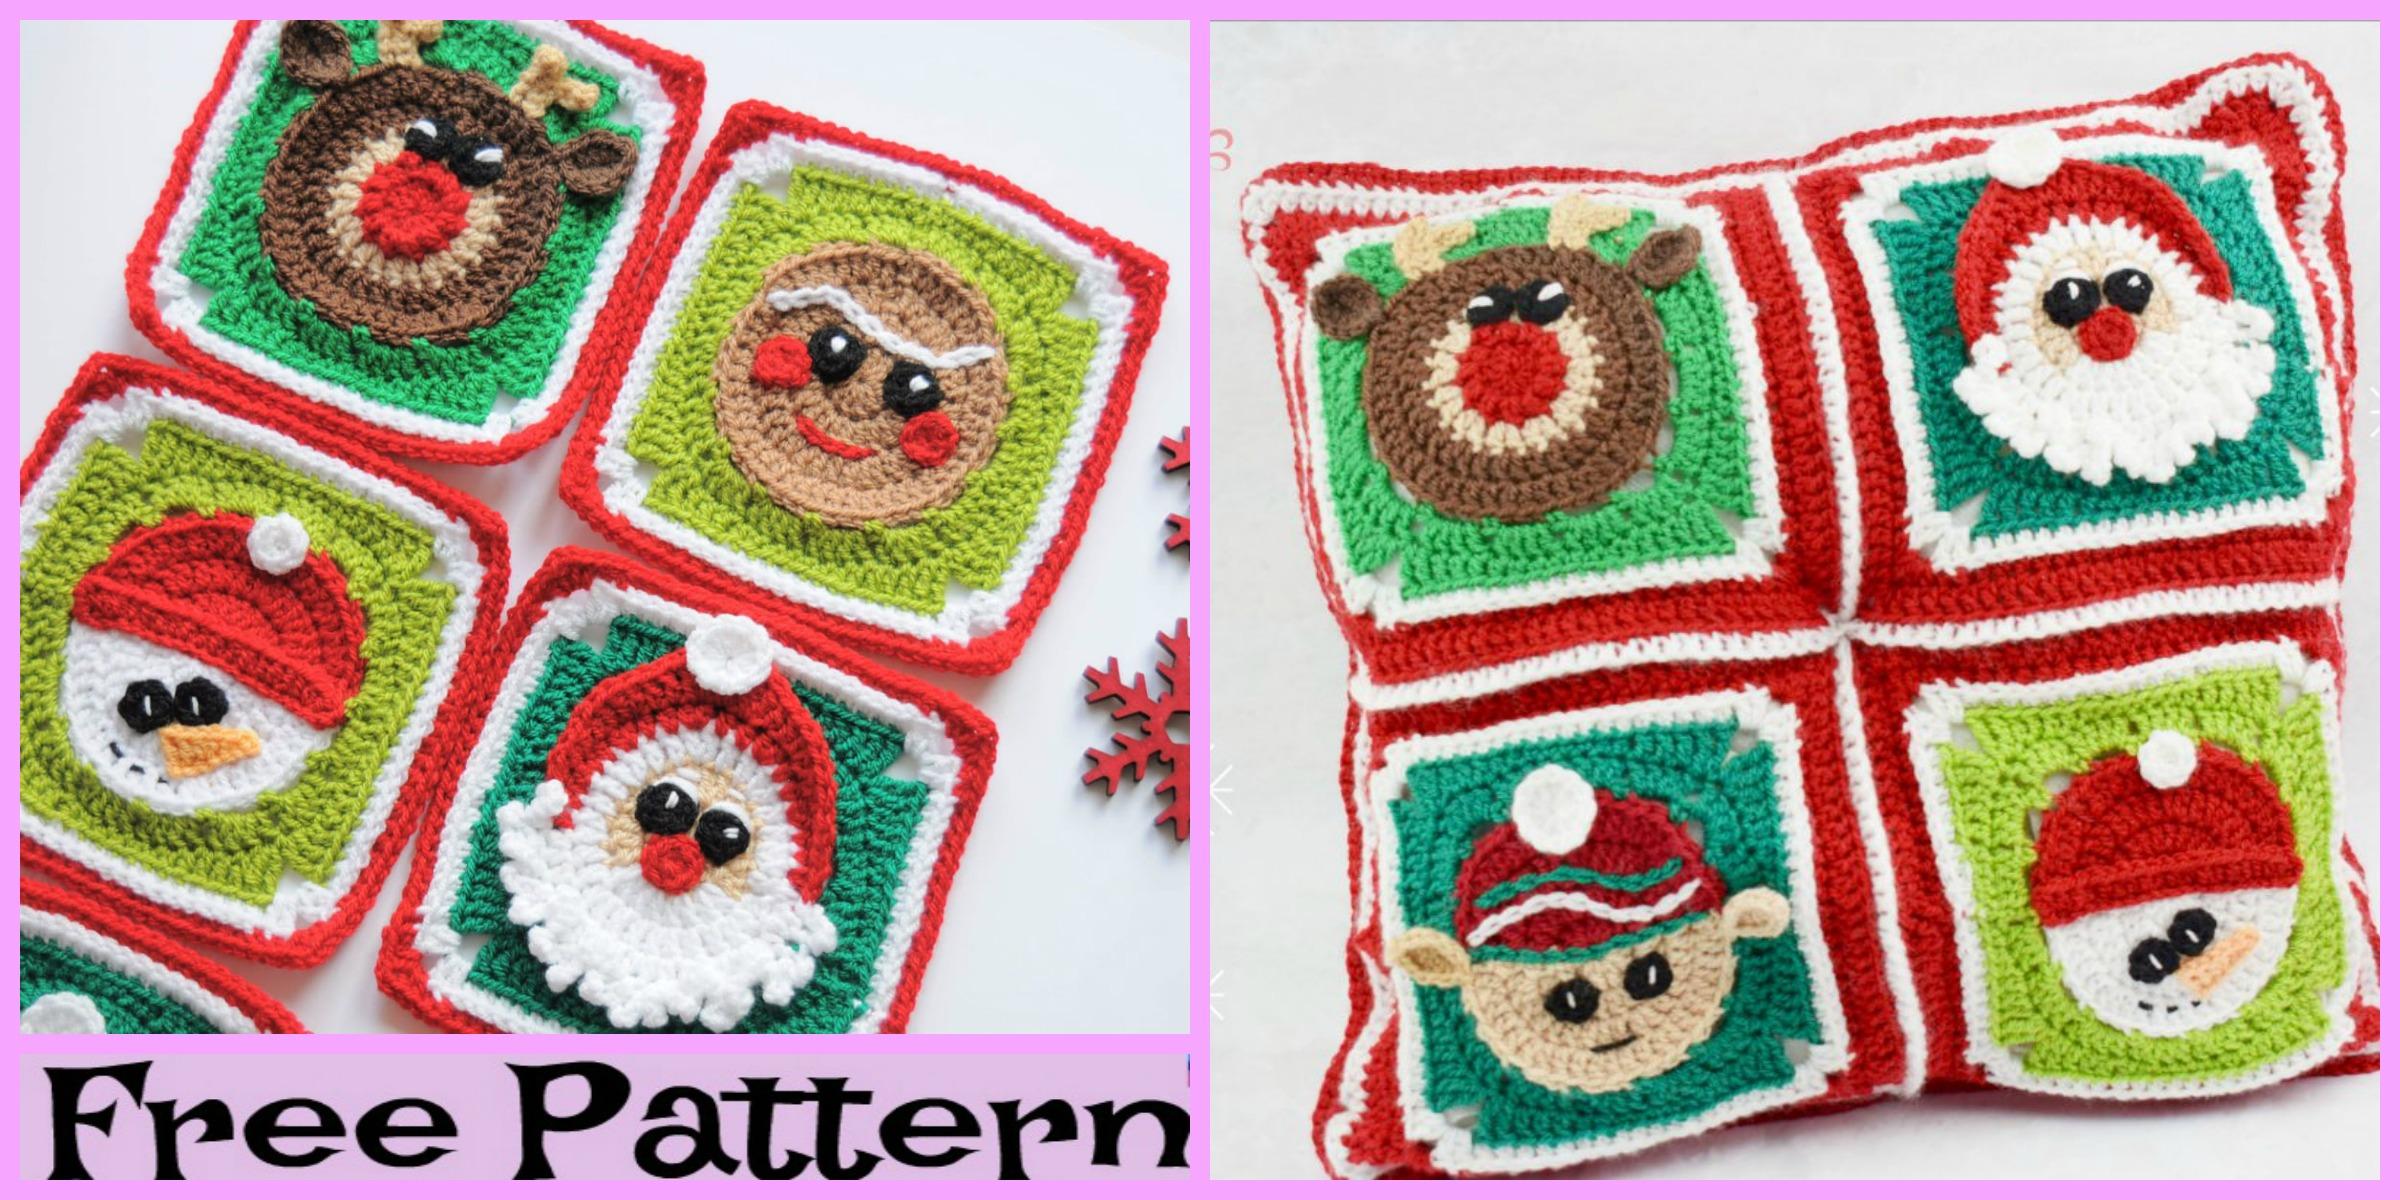 diy4ever-Crochet Christmas Granny Squares - Free Pattern